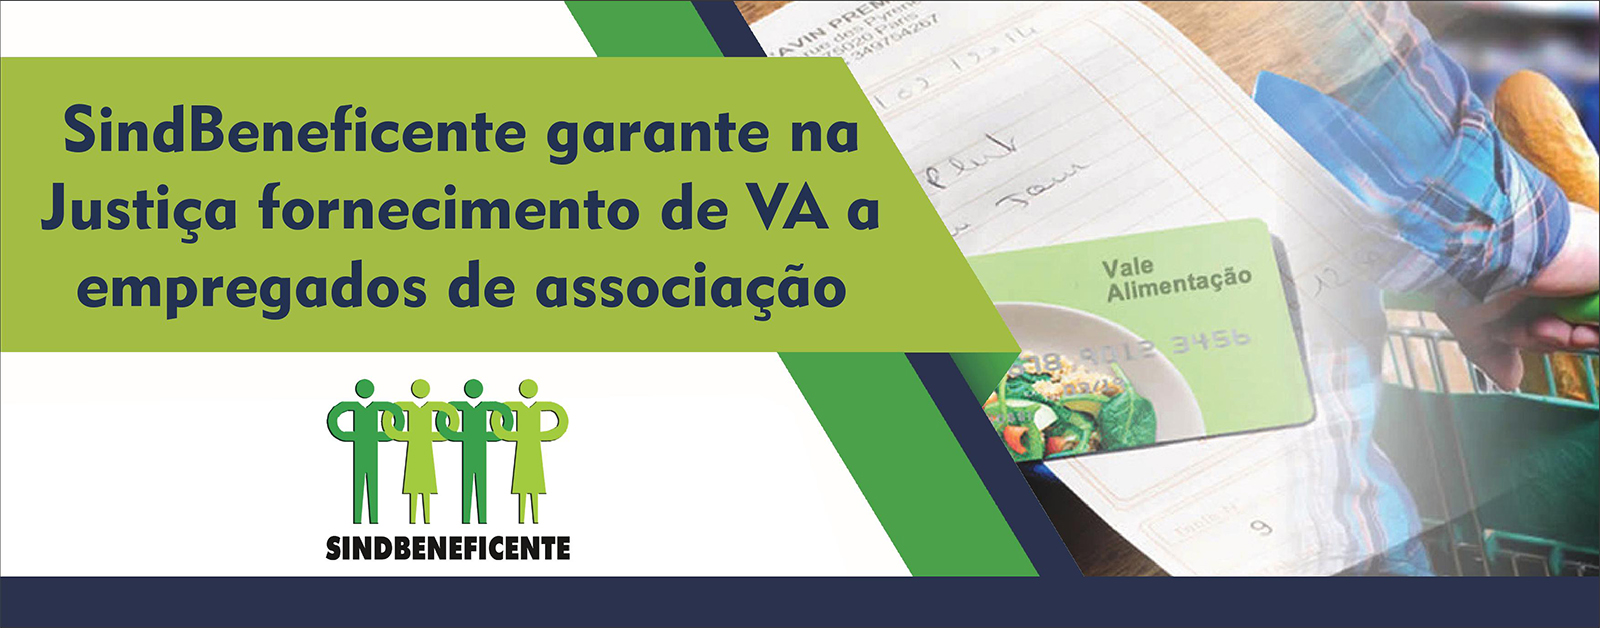 Entidade de Guarujá foi condenada a pagar o benefício referente ao período de 04/2012 a 12/2015